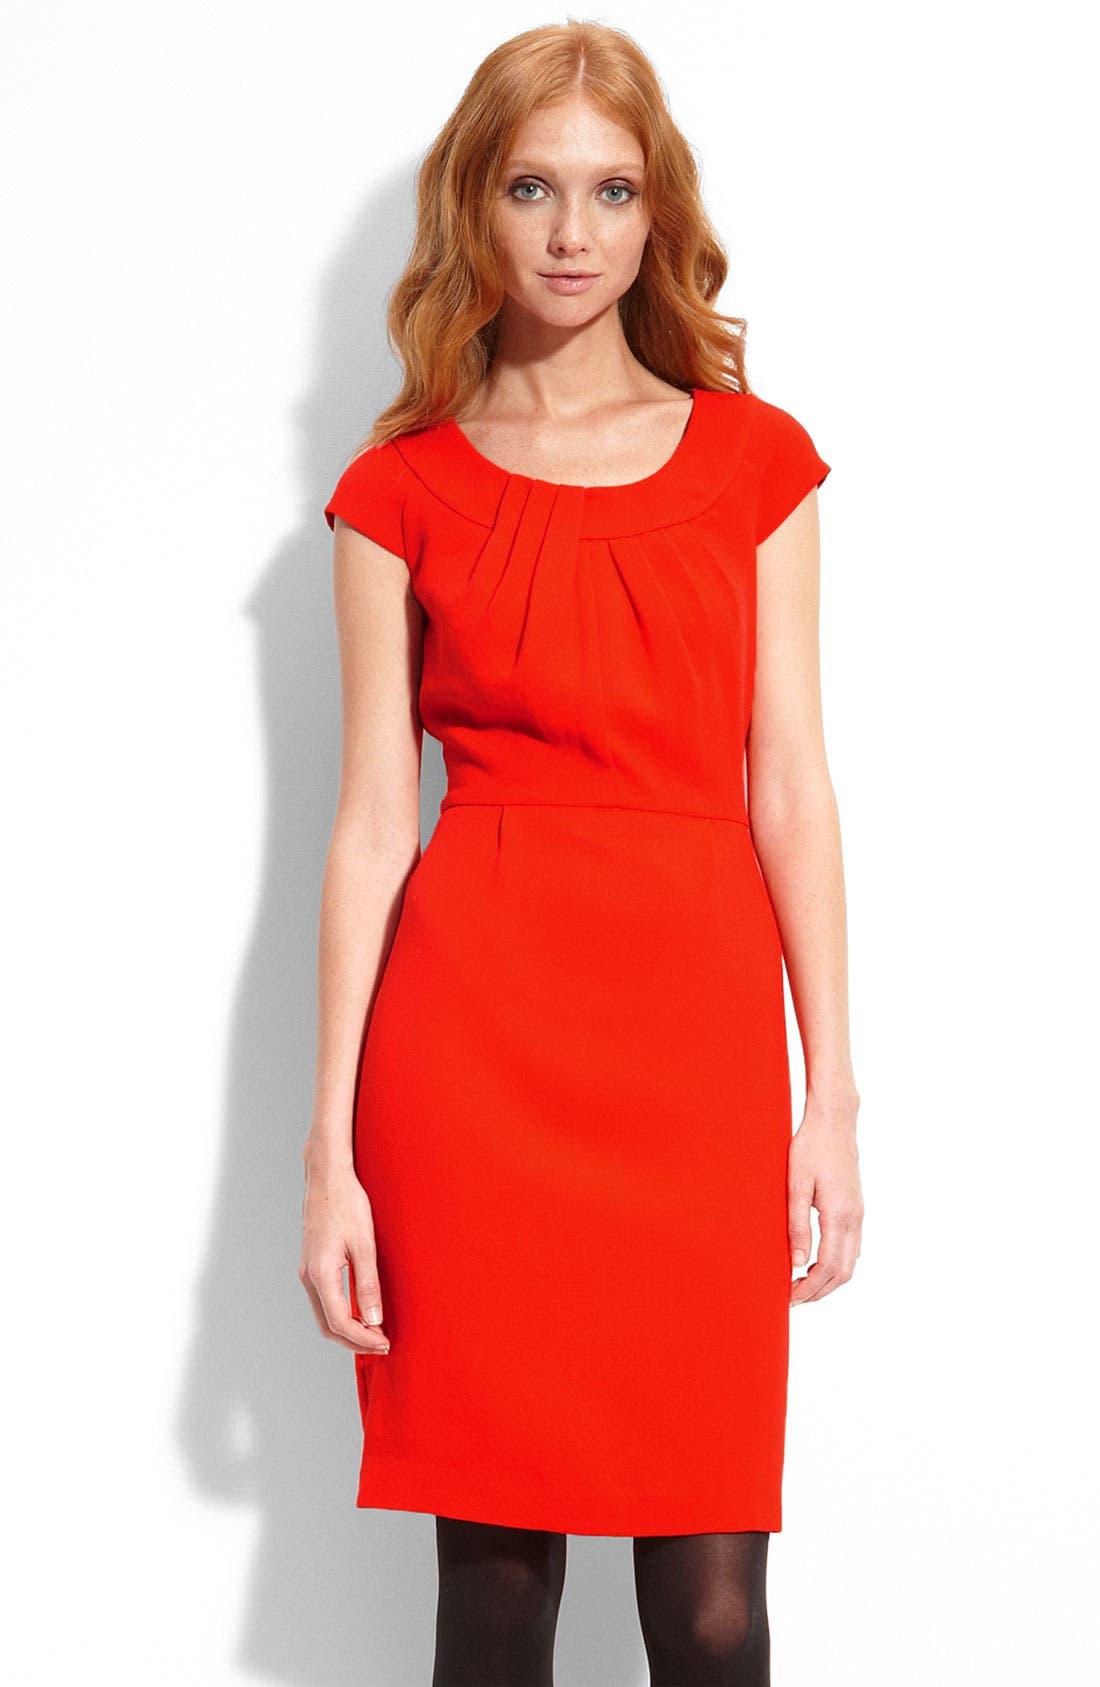 Alternate Image 1 Selected - kate spade new york 'raya' dress